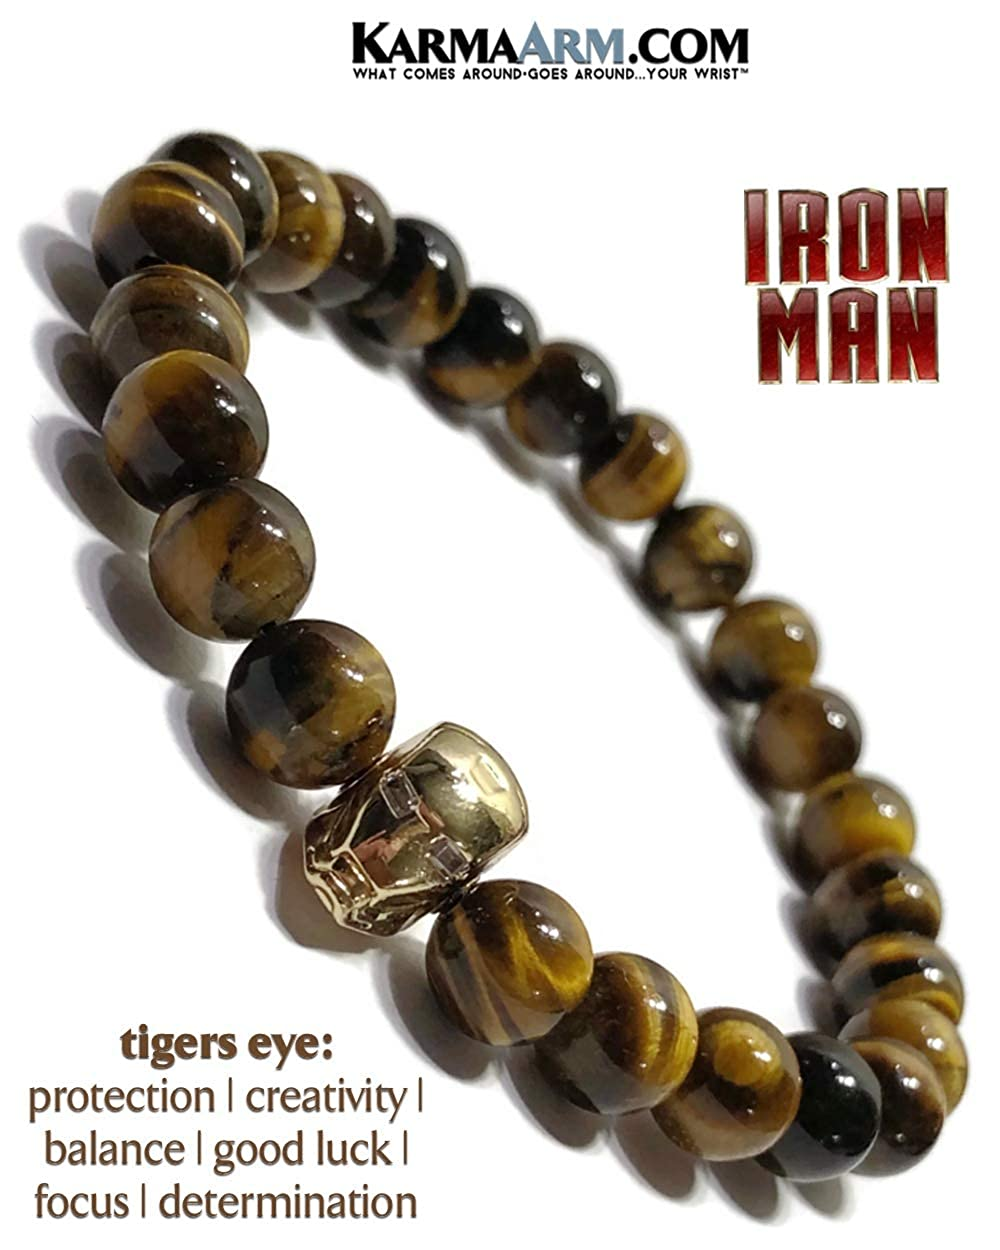 KarmaArm Iron Man Bracelet Tigers Eye Yoga Reiki Healing Energy Boho Beaded Meditation Stretch Mens Womens Jewelry Superhero Comic-Con Cosplay Bracelets Avengers Bracelet